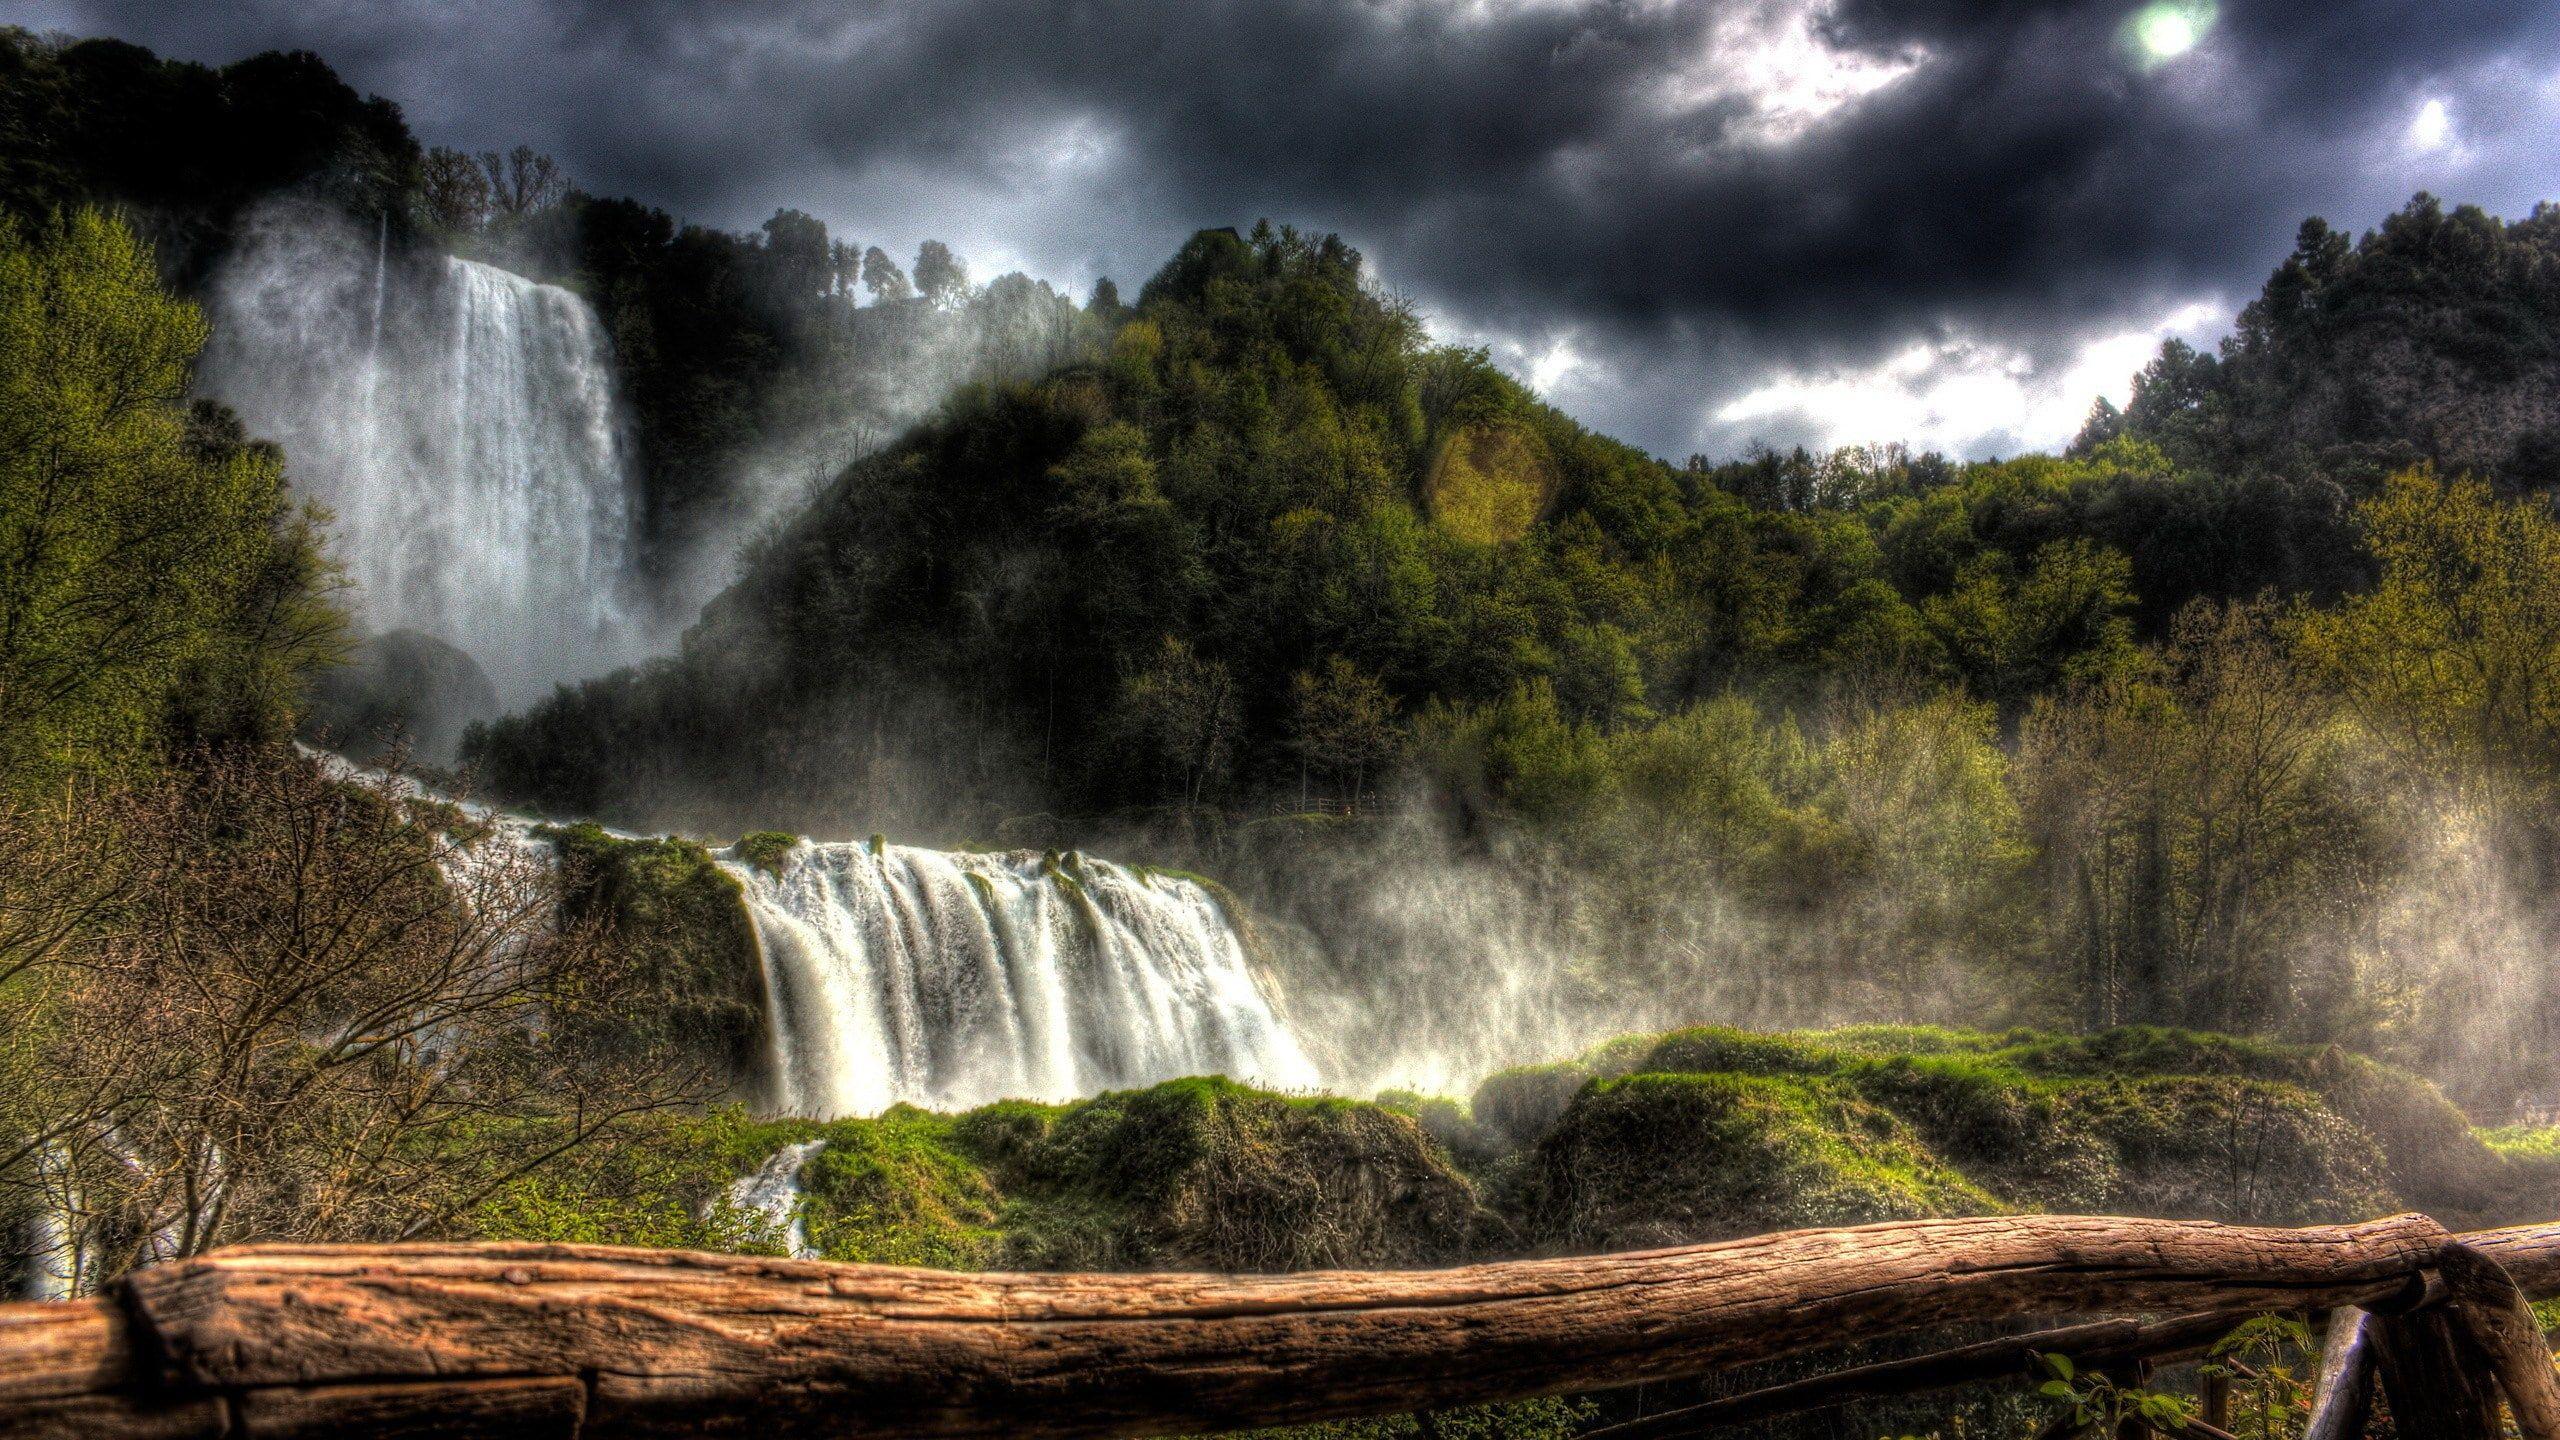 Nature Beauty Desktop Hd Images 2560x1440 2k Wallpaper Hdwallpaper Desktop Forest Waterfall Waterfall Waterfall Pictures